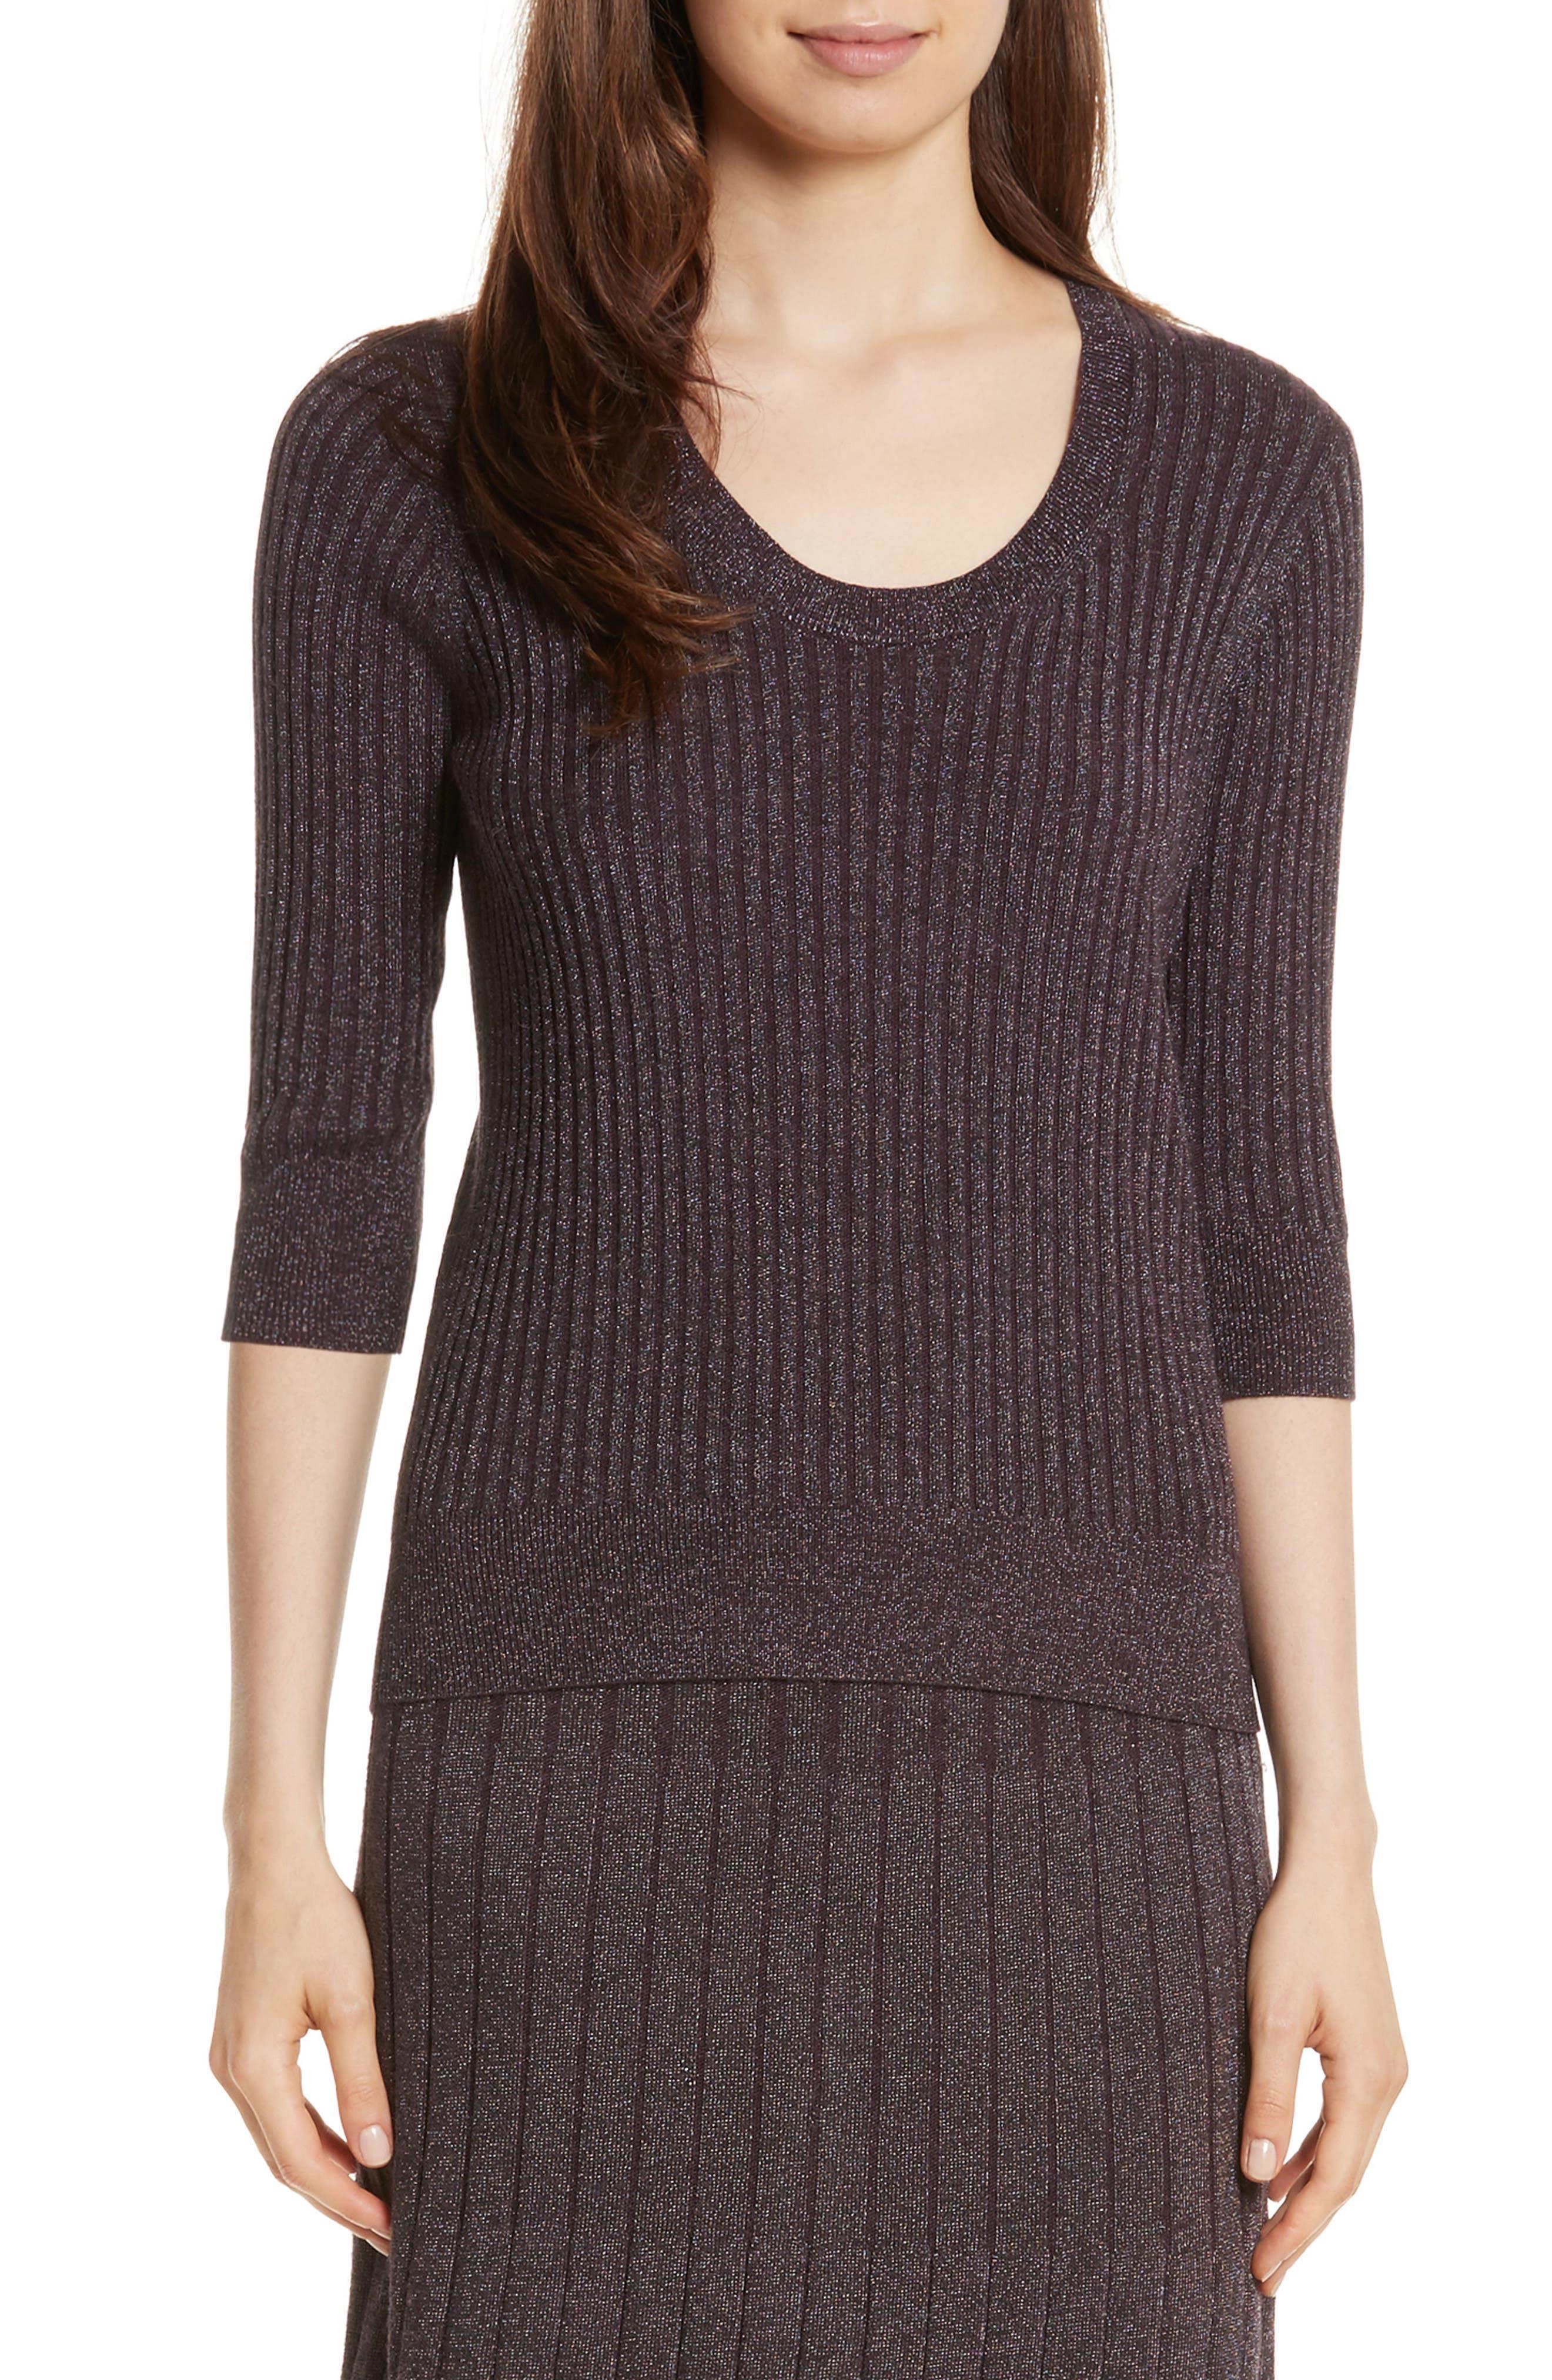 Alternate Image 1 Selected - Rebecca Taylor Metallic Rib Sweater